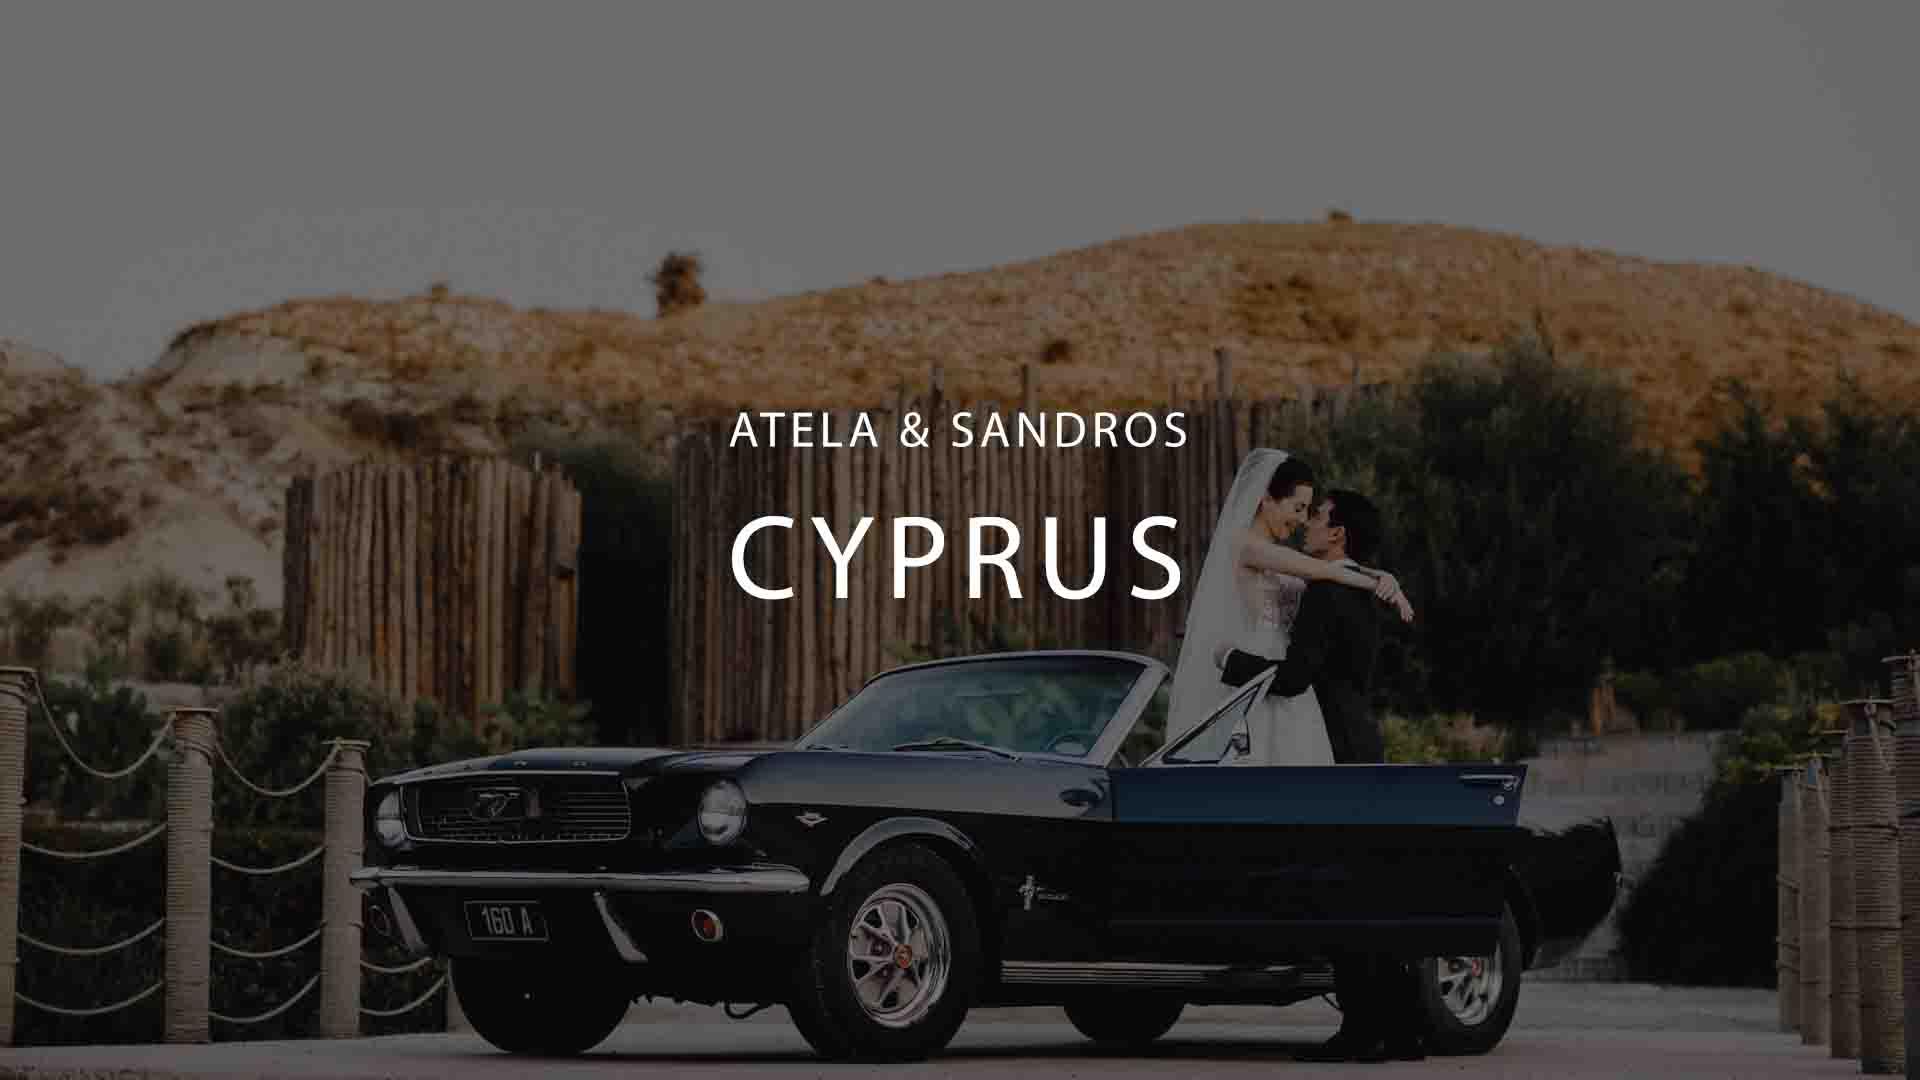 Real Cyprus wedding story